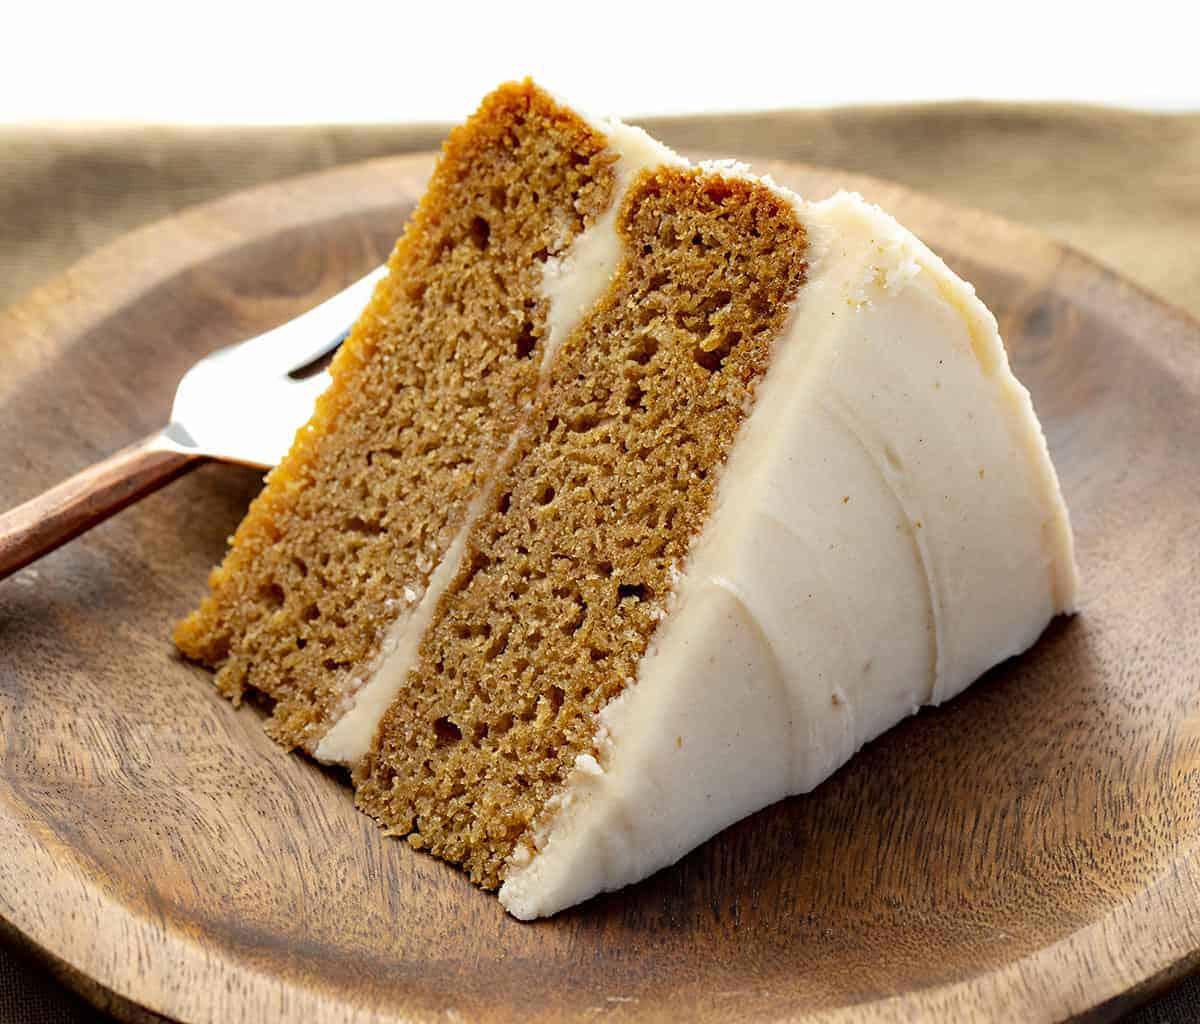 Apple Butter Cake Slice on Plate